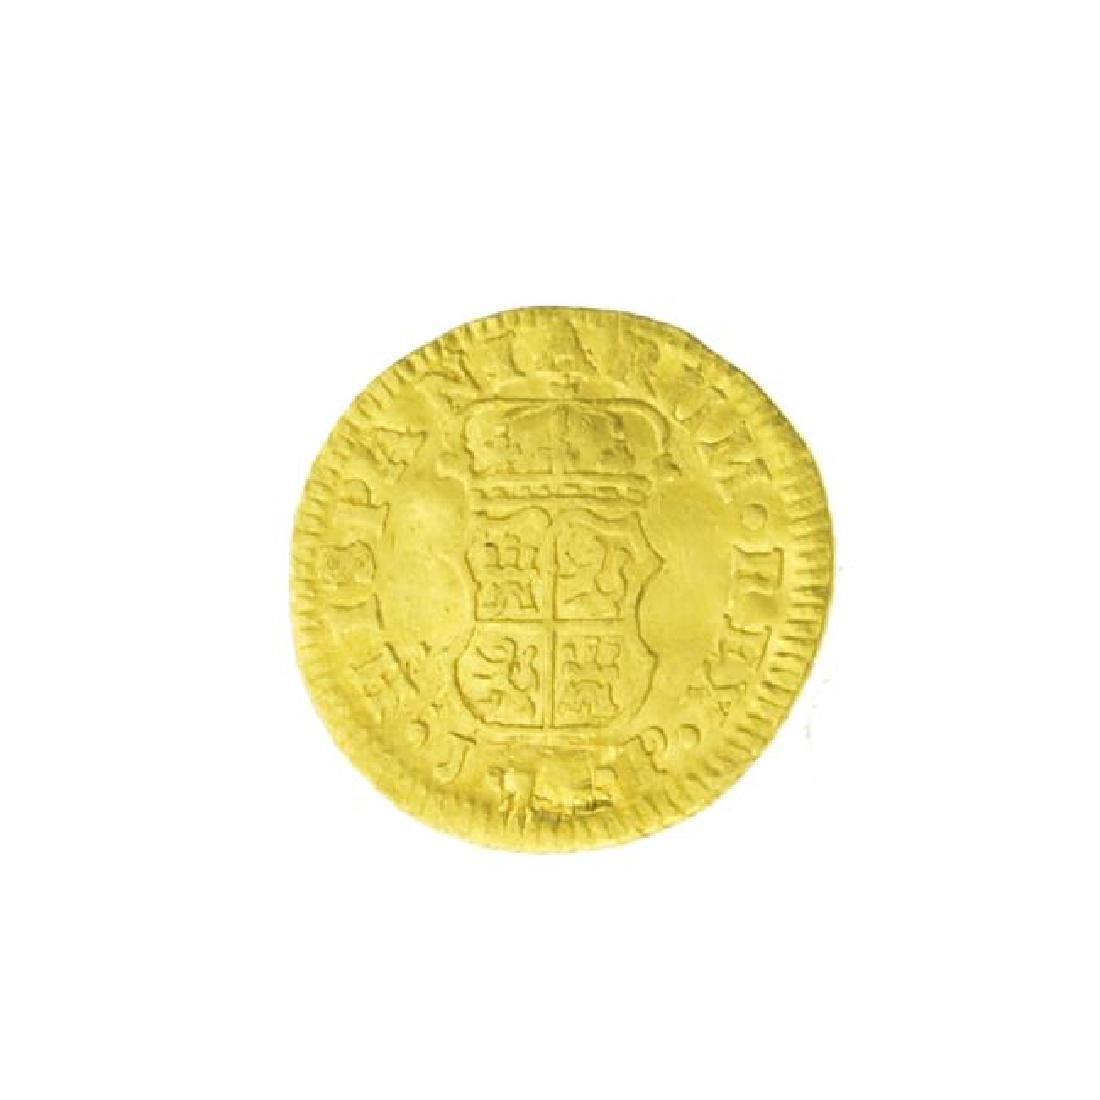 1760 Spanish Cob Gold Coin (JG) - 2